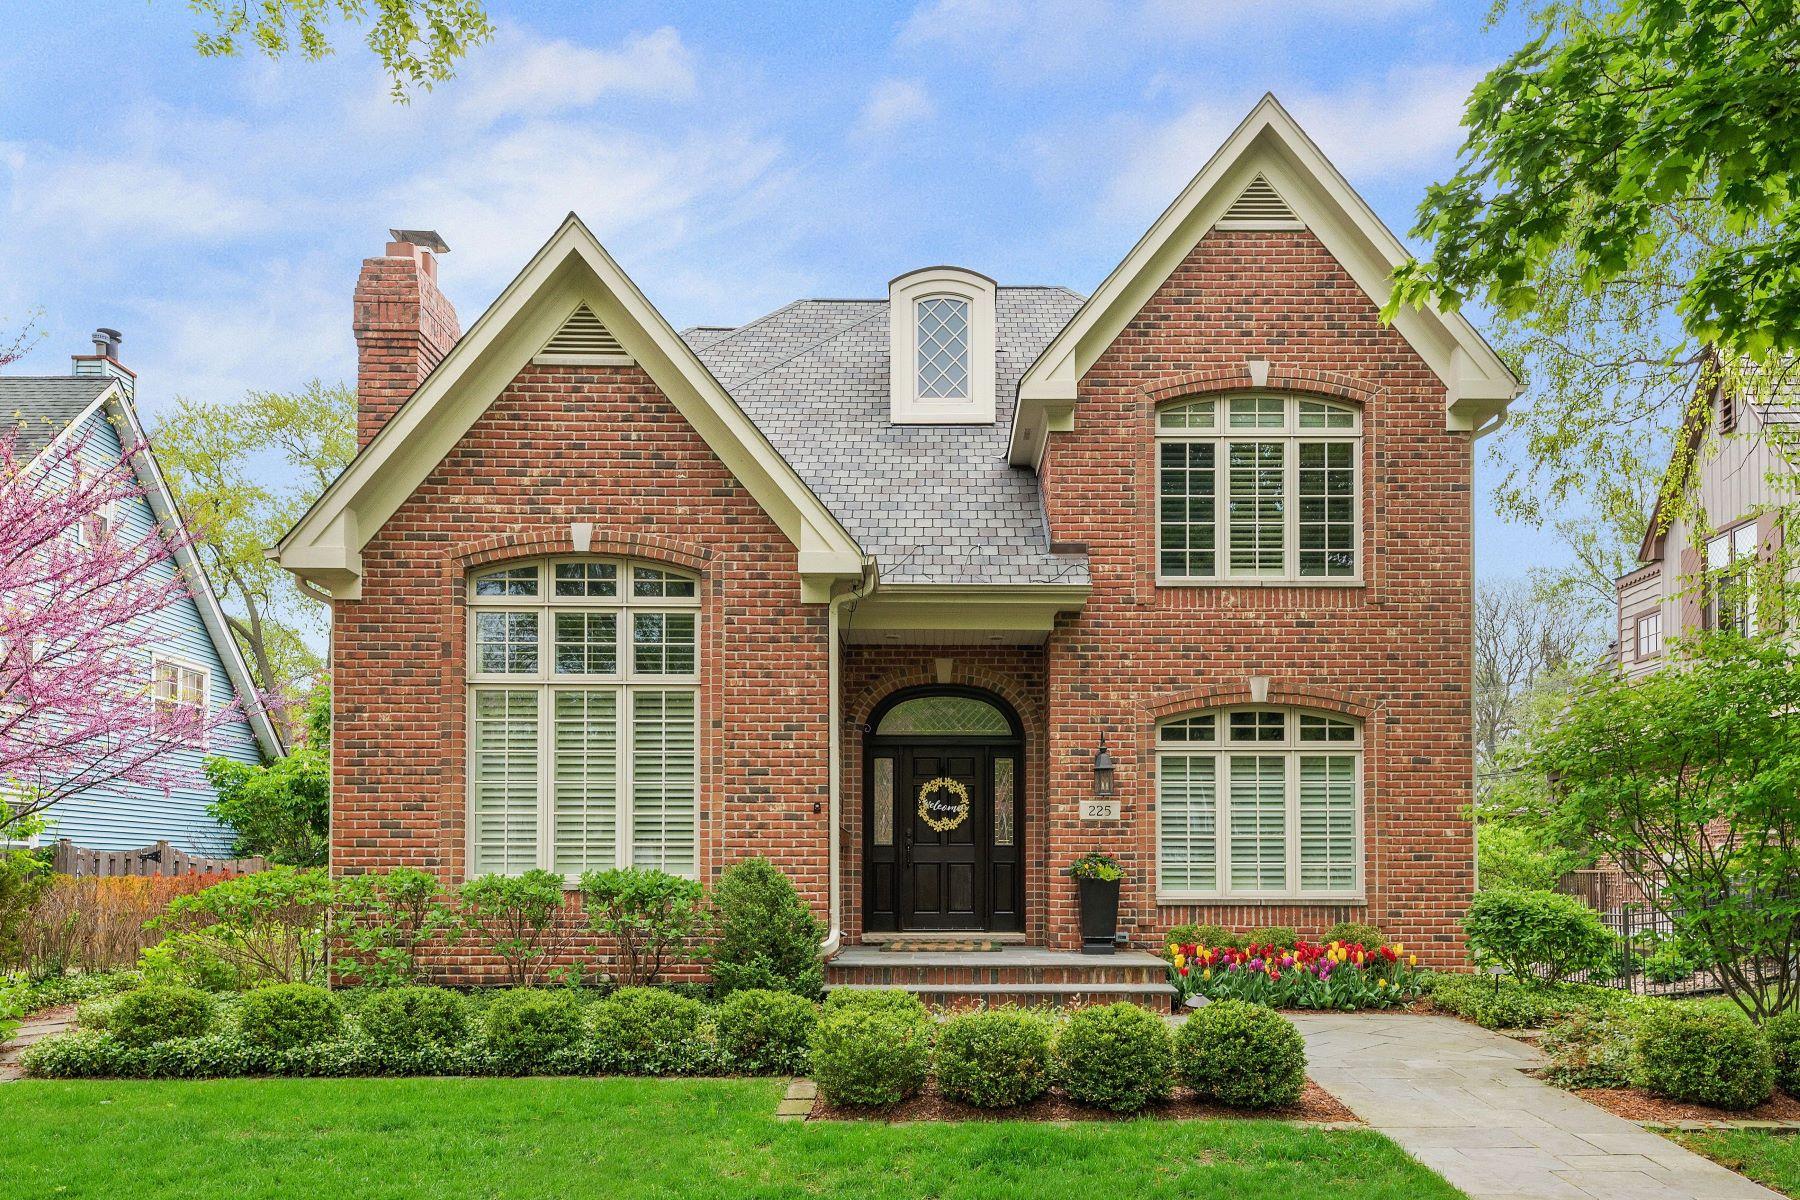 Частный односемейный дом для того Продажа на Luxury And Lifestyle Strike The Perfect Balance 225 N Grant Street Hinsdale, Иллинойс 60521 Соединенные Штаты